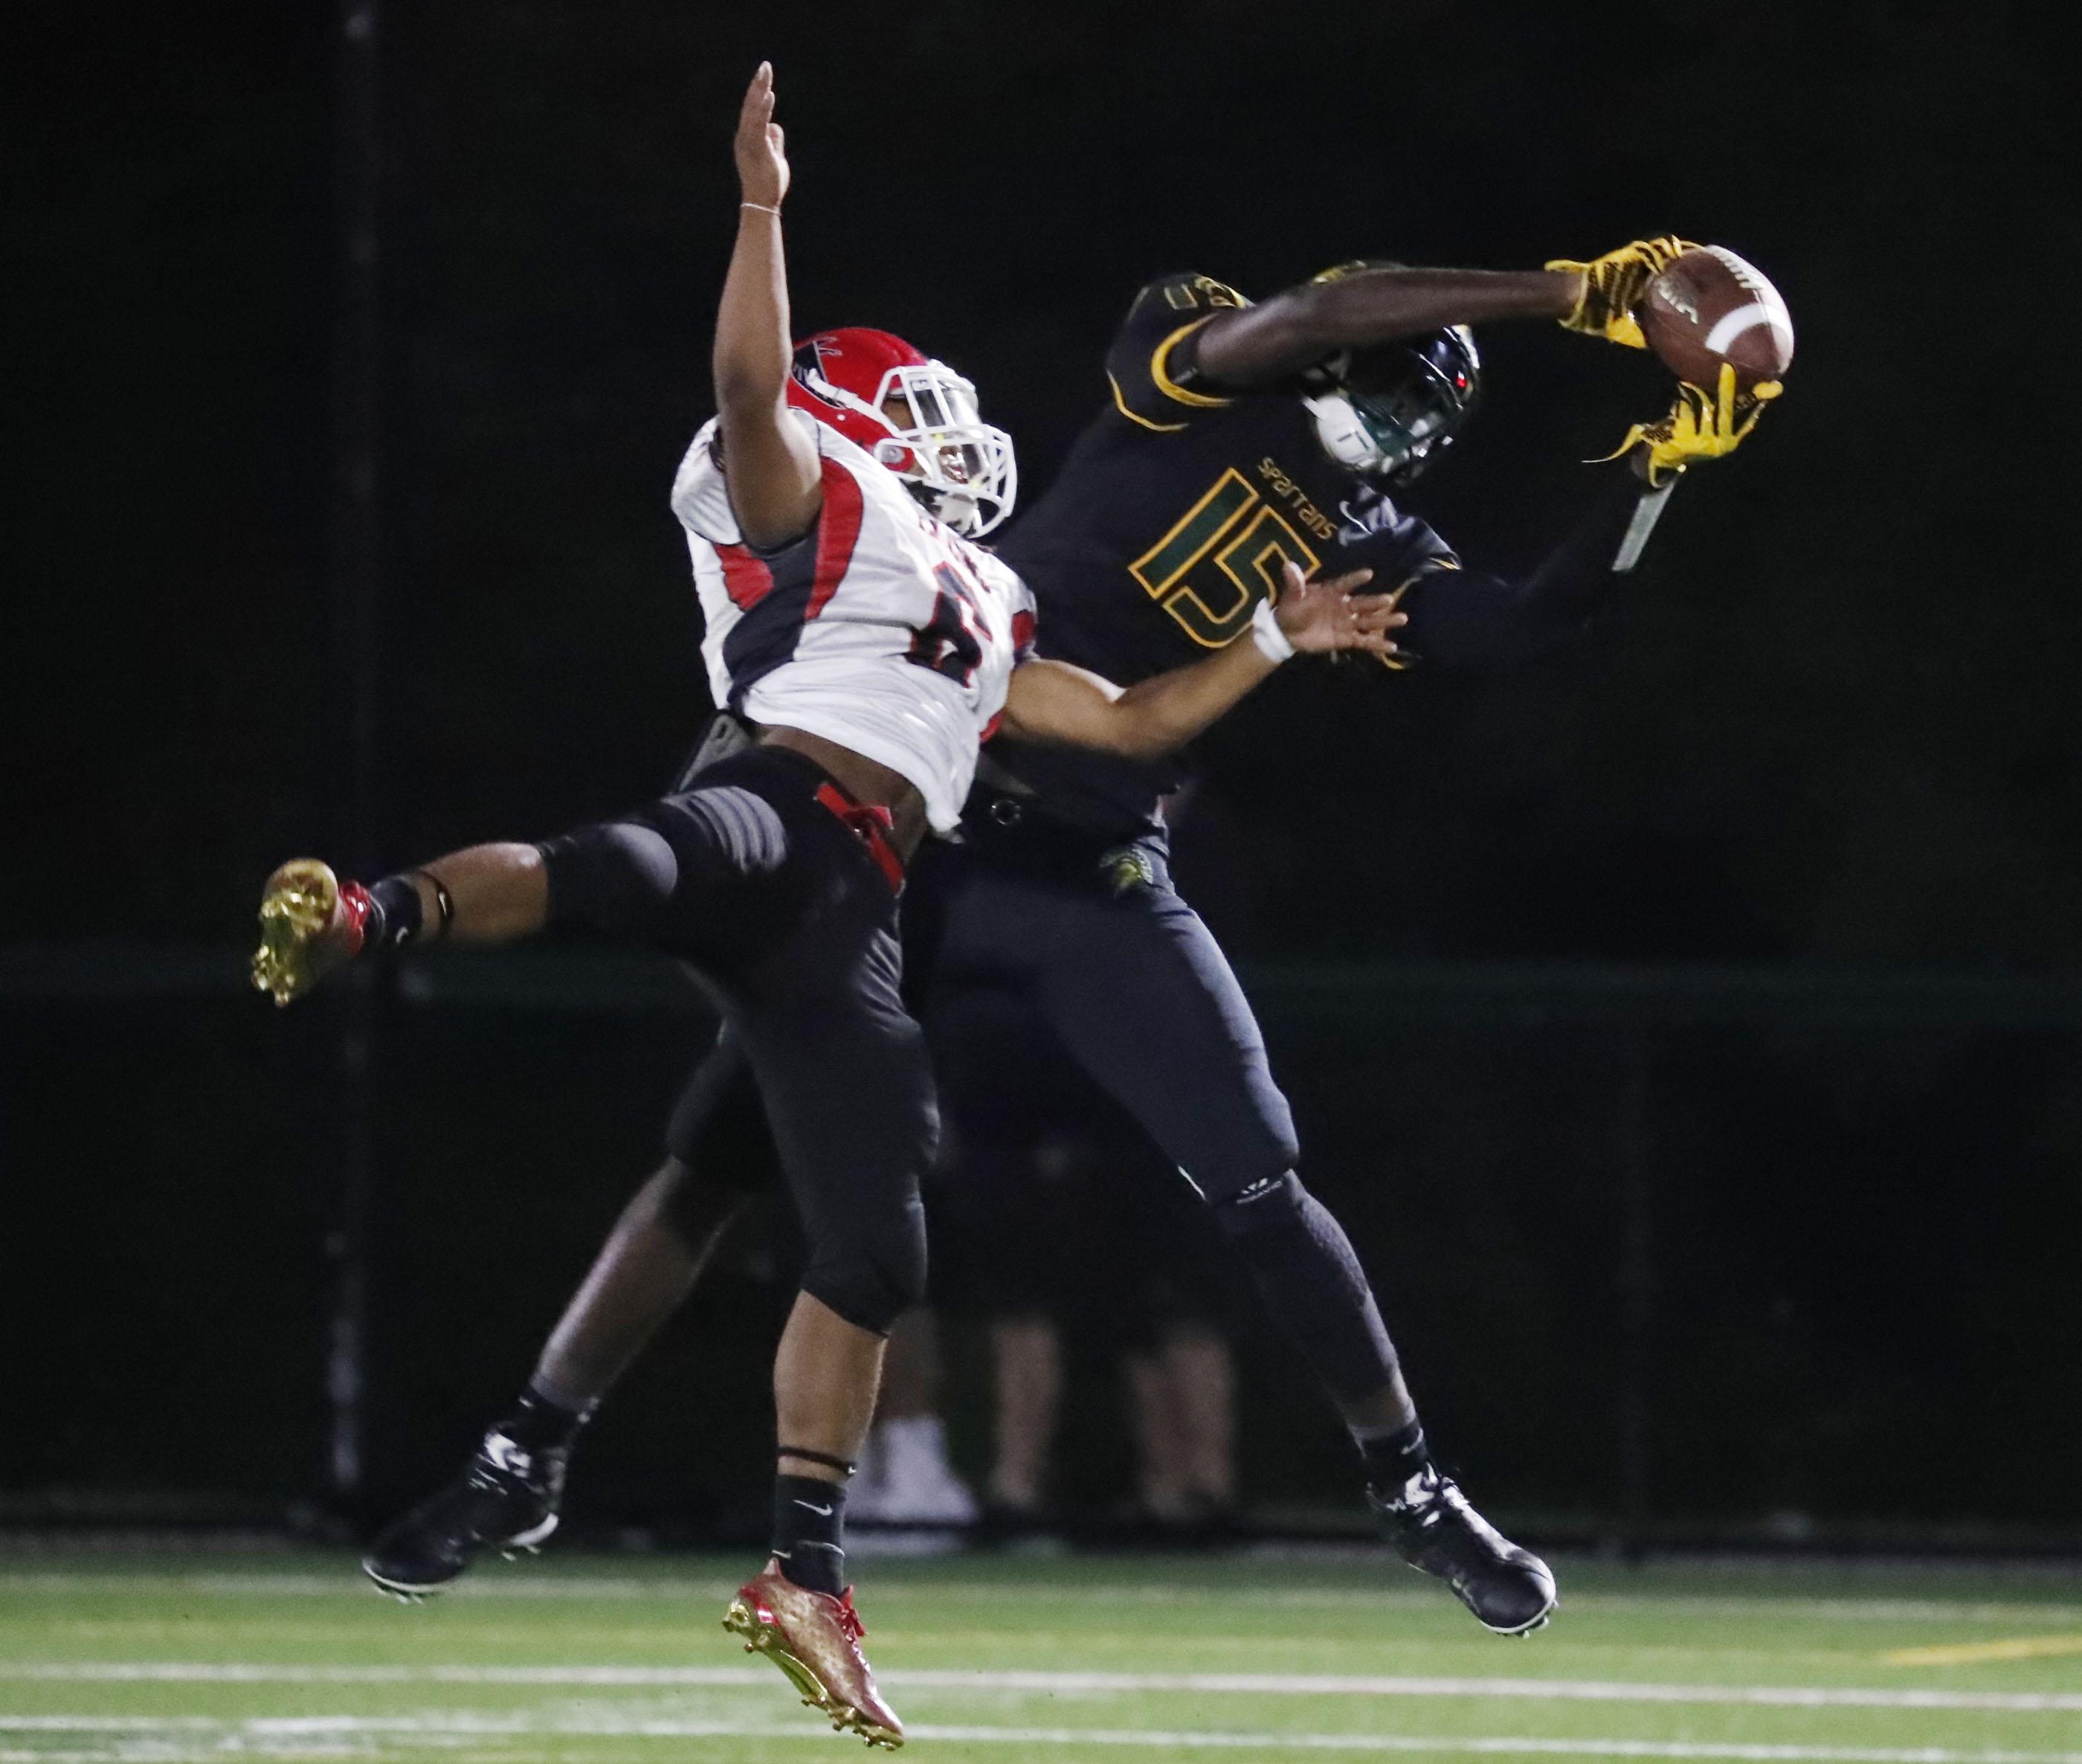 Williamsville North's Jairus Huggins catches a touchdown pass against Niagara-Wheatfield during Friday's game.